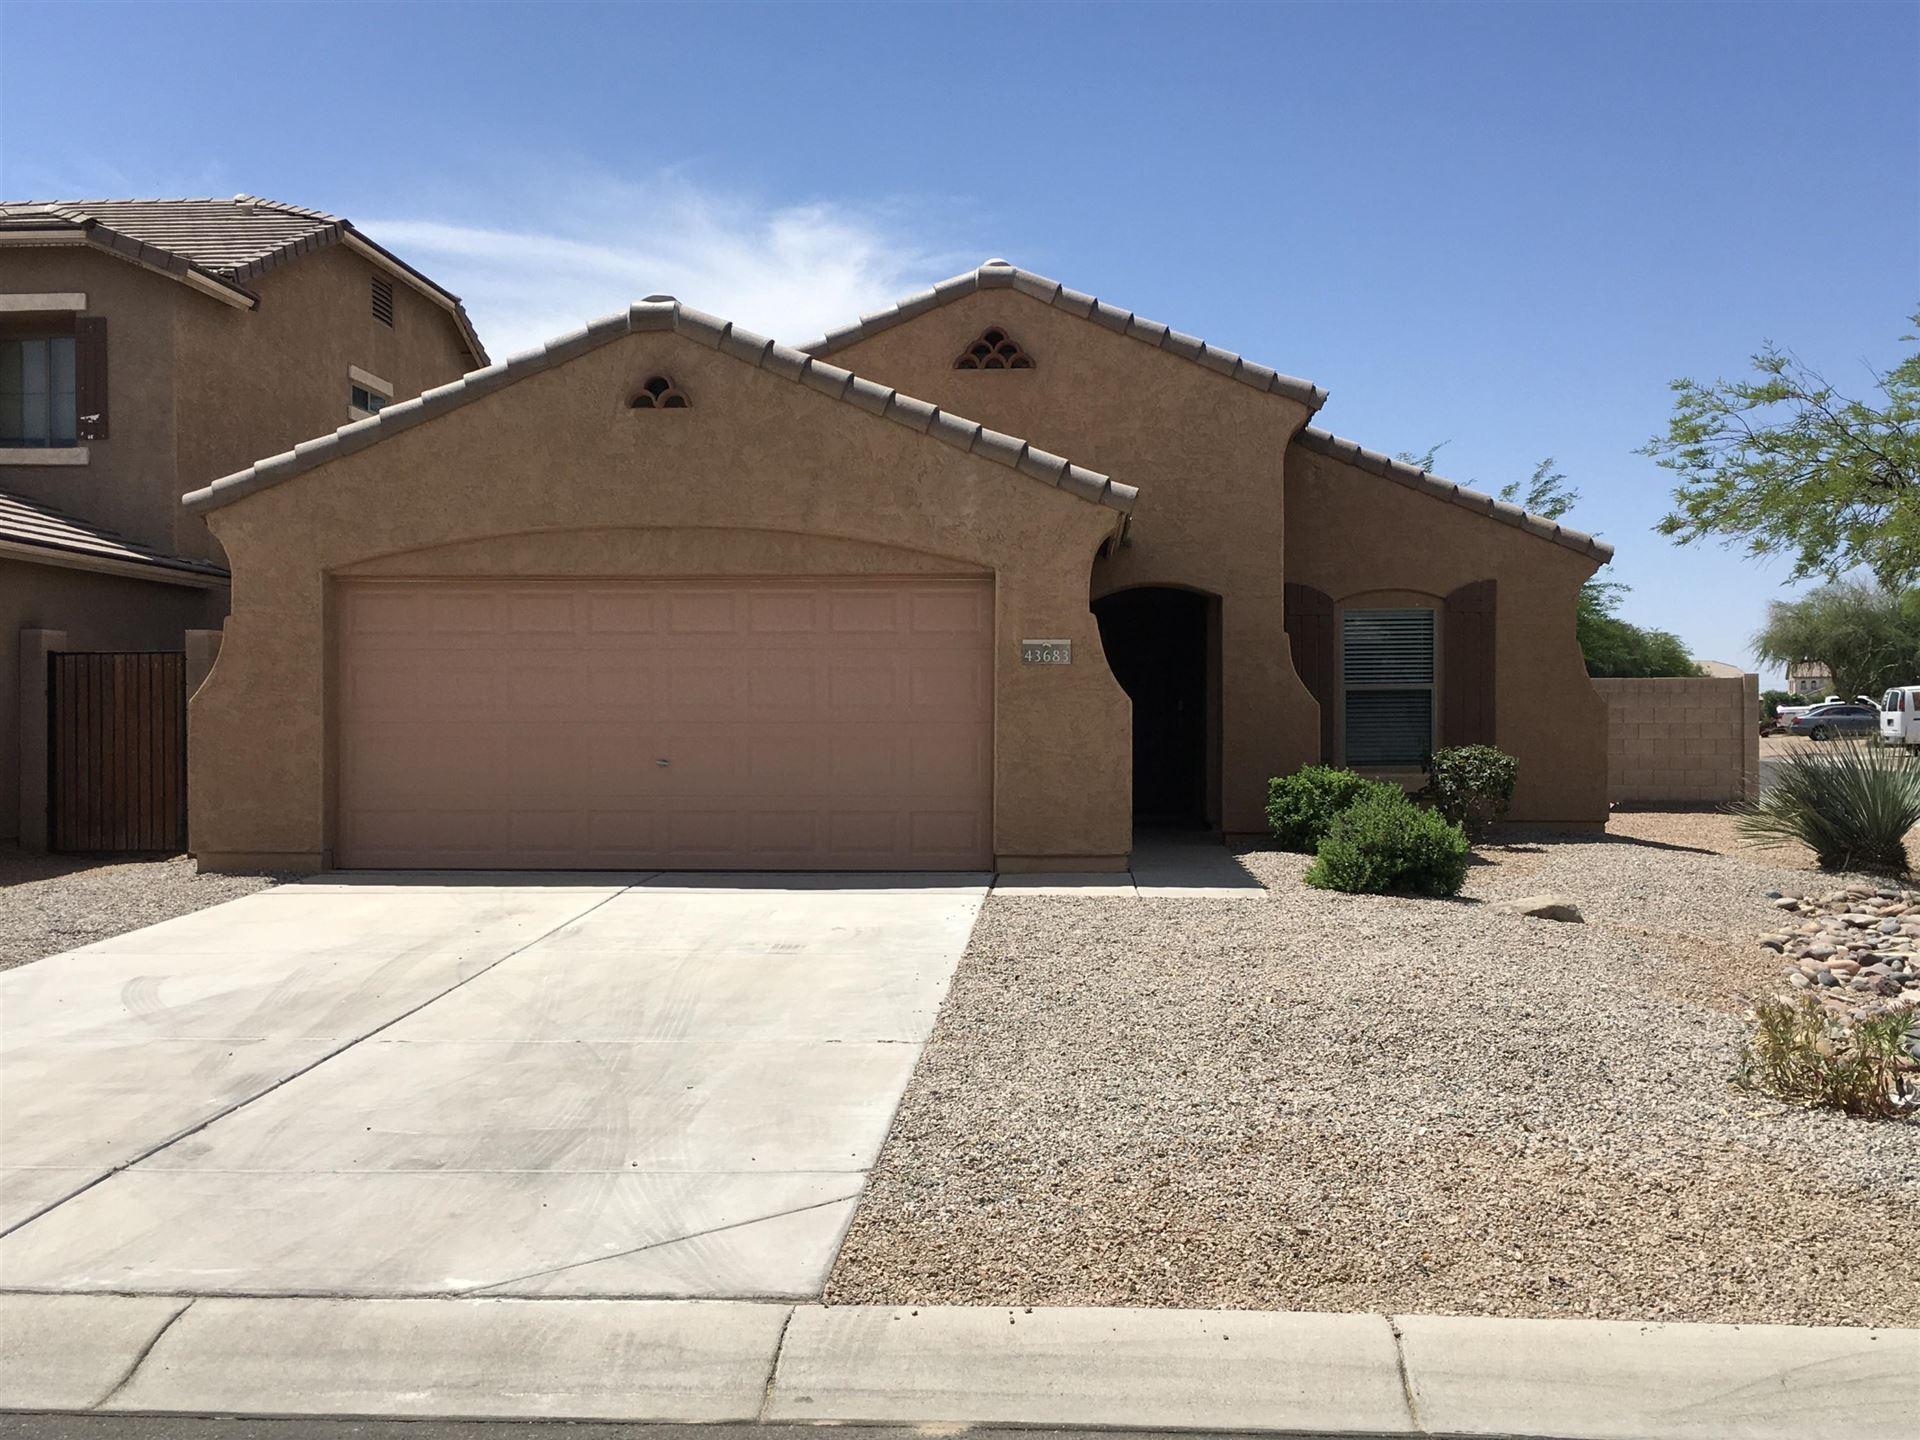 Photo for 43683 W ARIZONA Avenue, Maricopa, AZ 85138 (MLS # 6232344)